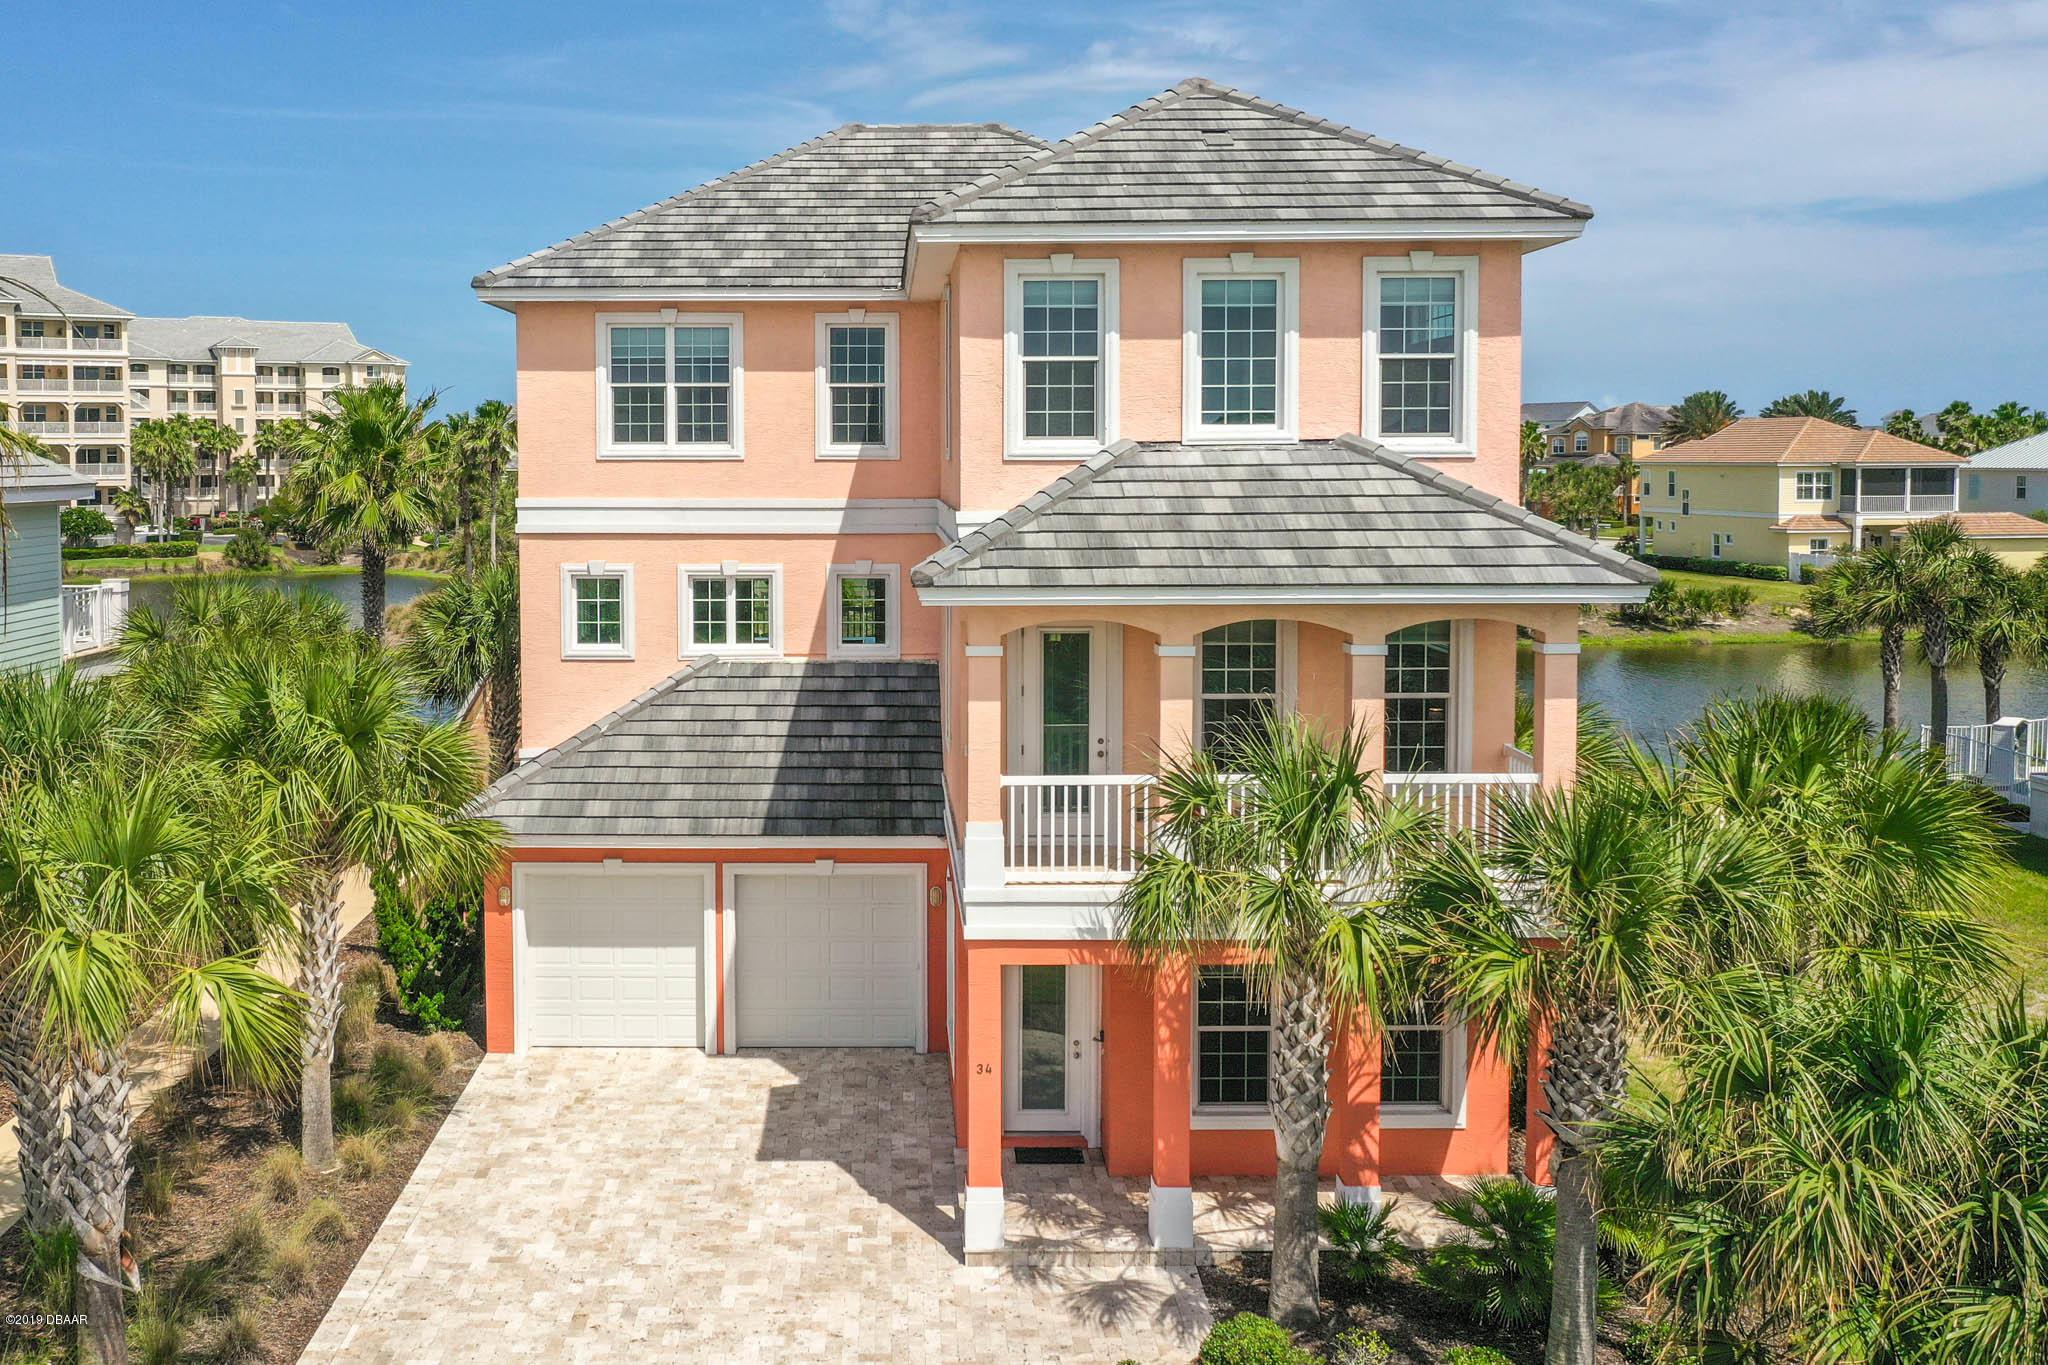 Photo of 34 Cinnamon Beach Way, Palm Coast, FL 32137